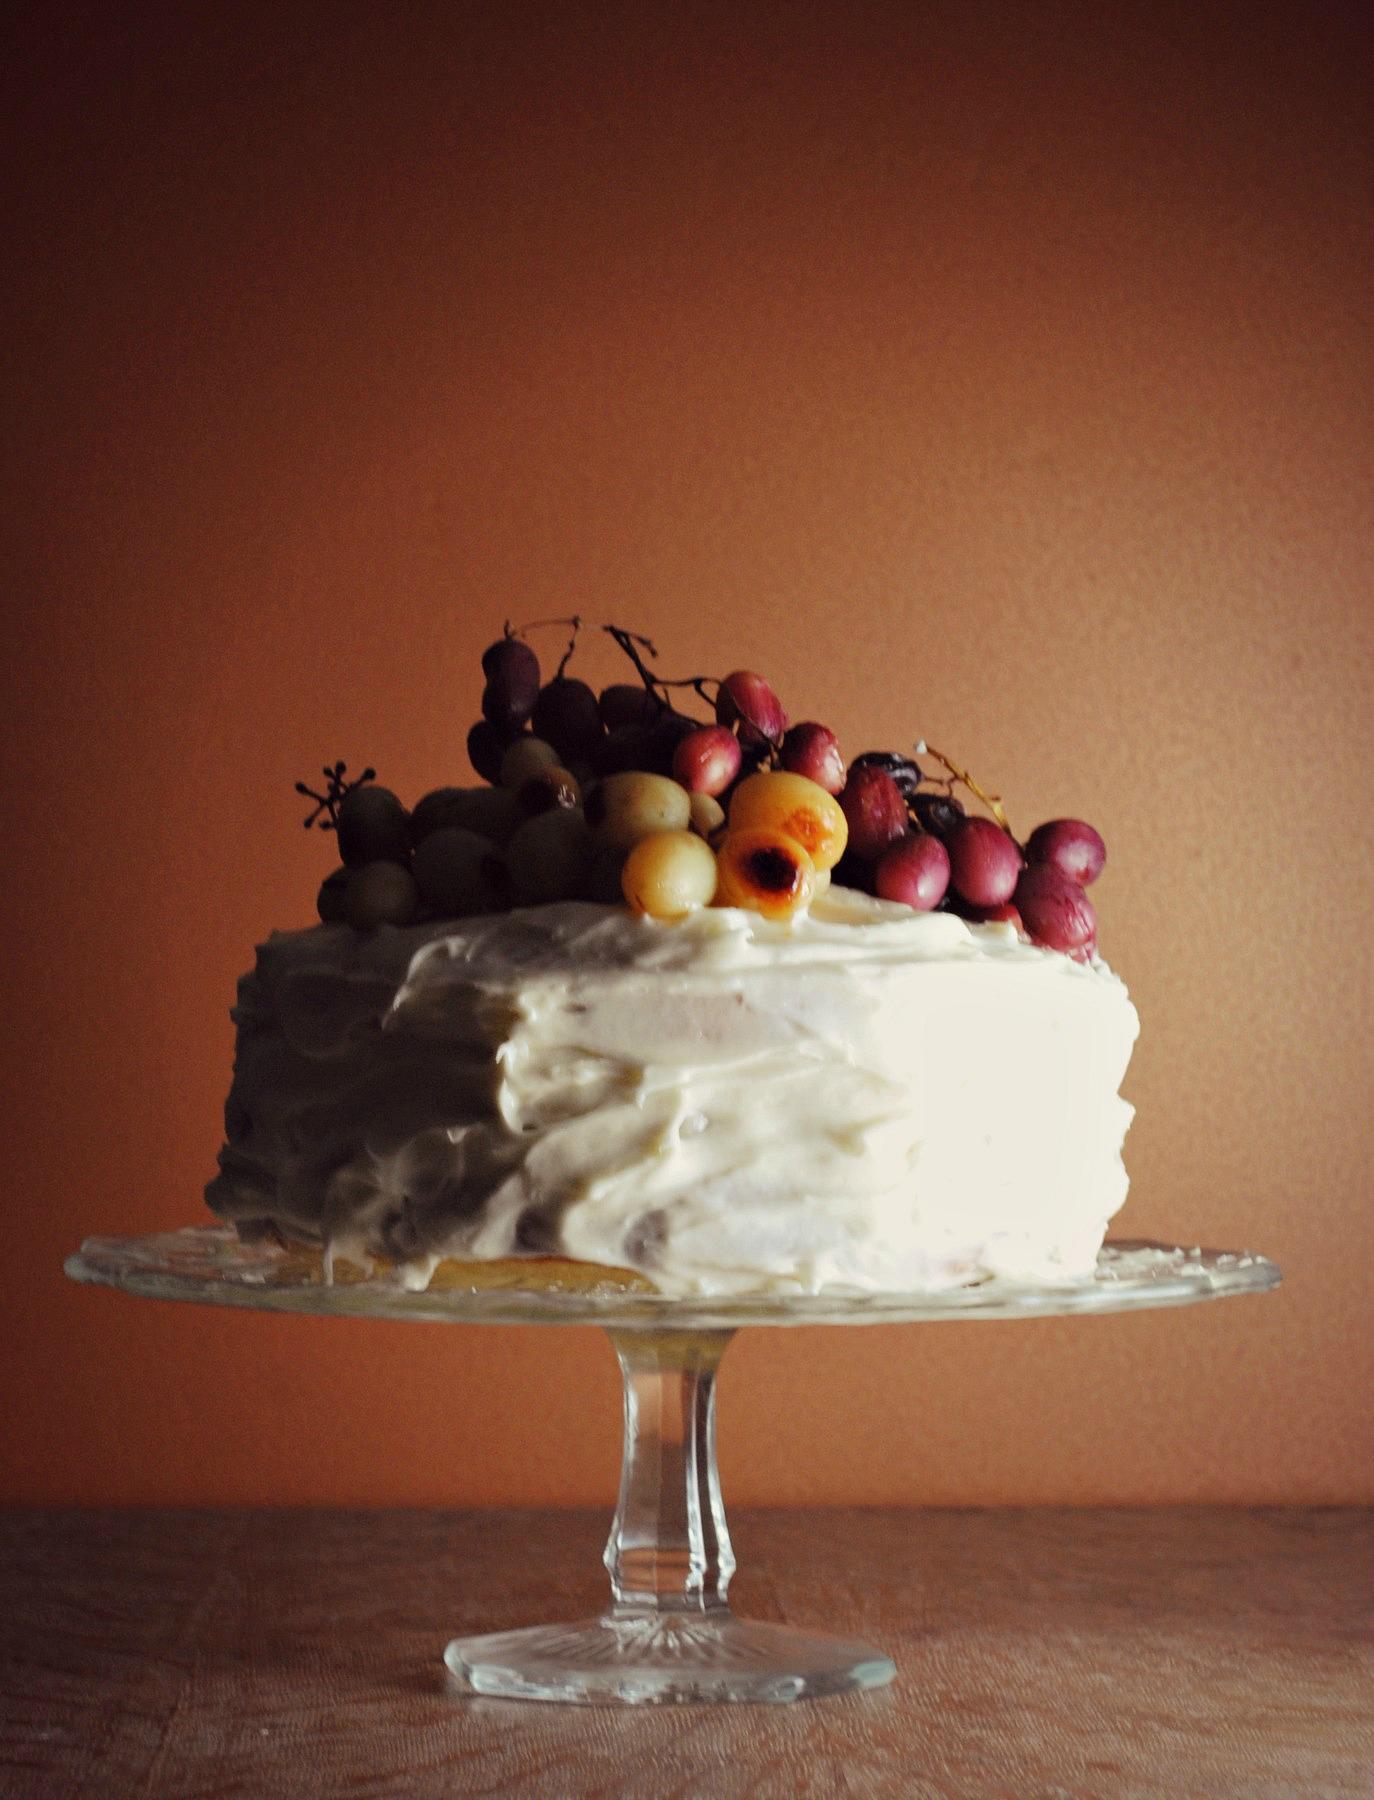 roasted-grape-champagne-cake-VianneyRodriguez-sweetlifebake